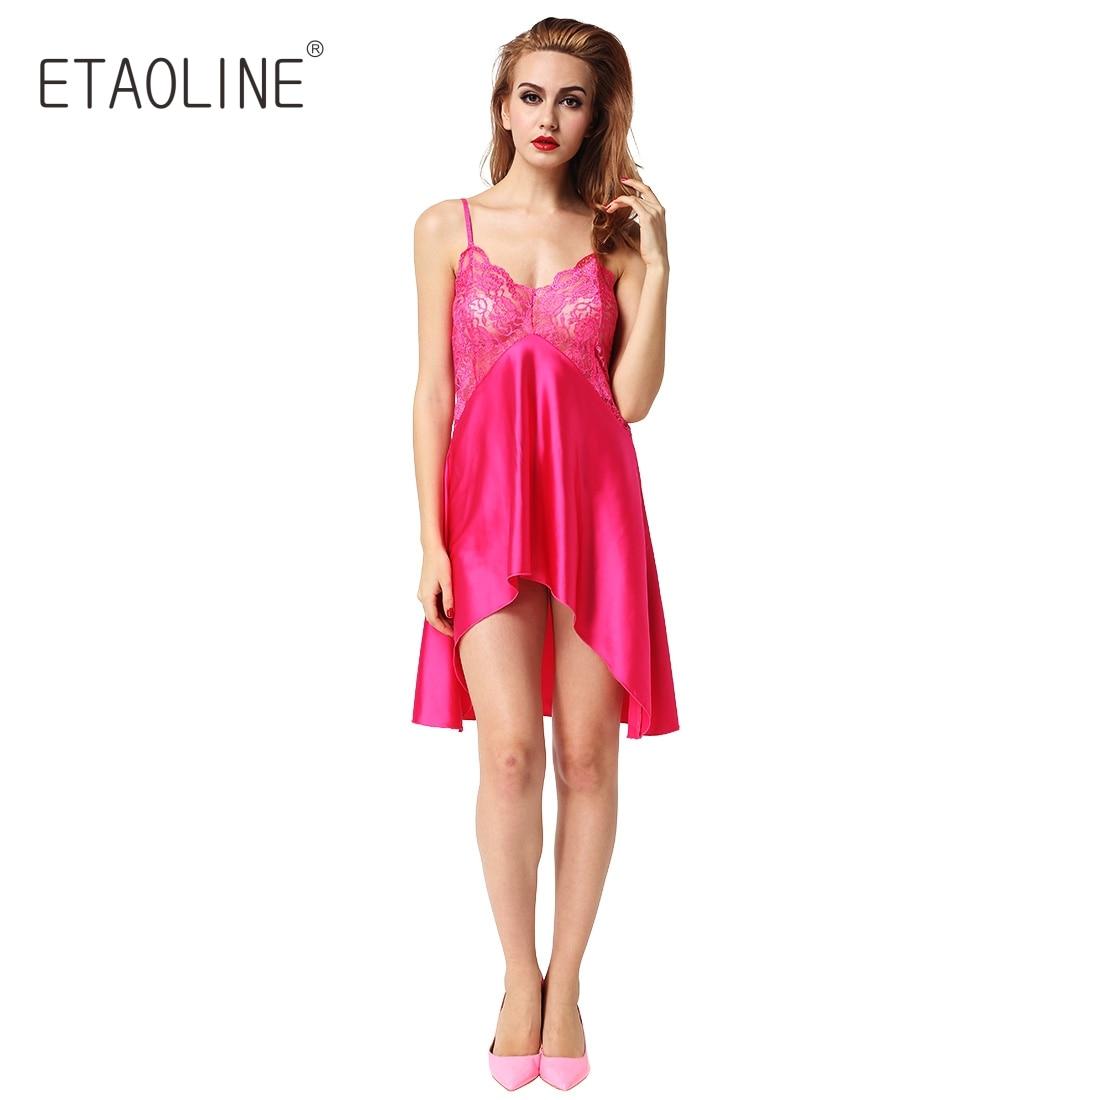 bc16909f159 ETAOLINE 2018 Womens Sleepwear White Satin Chemise Lace Babydoll Sexy  Nightie Nightgown Nightwear Irregular Cut Underwear R04-in Nightgowns    Sleepshirts ...